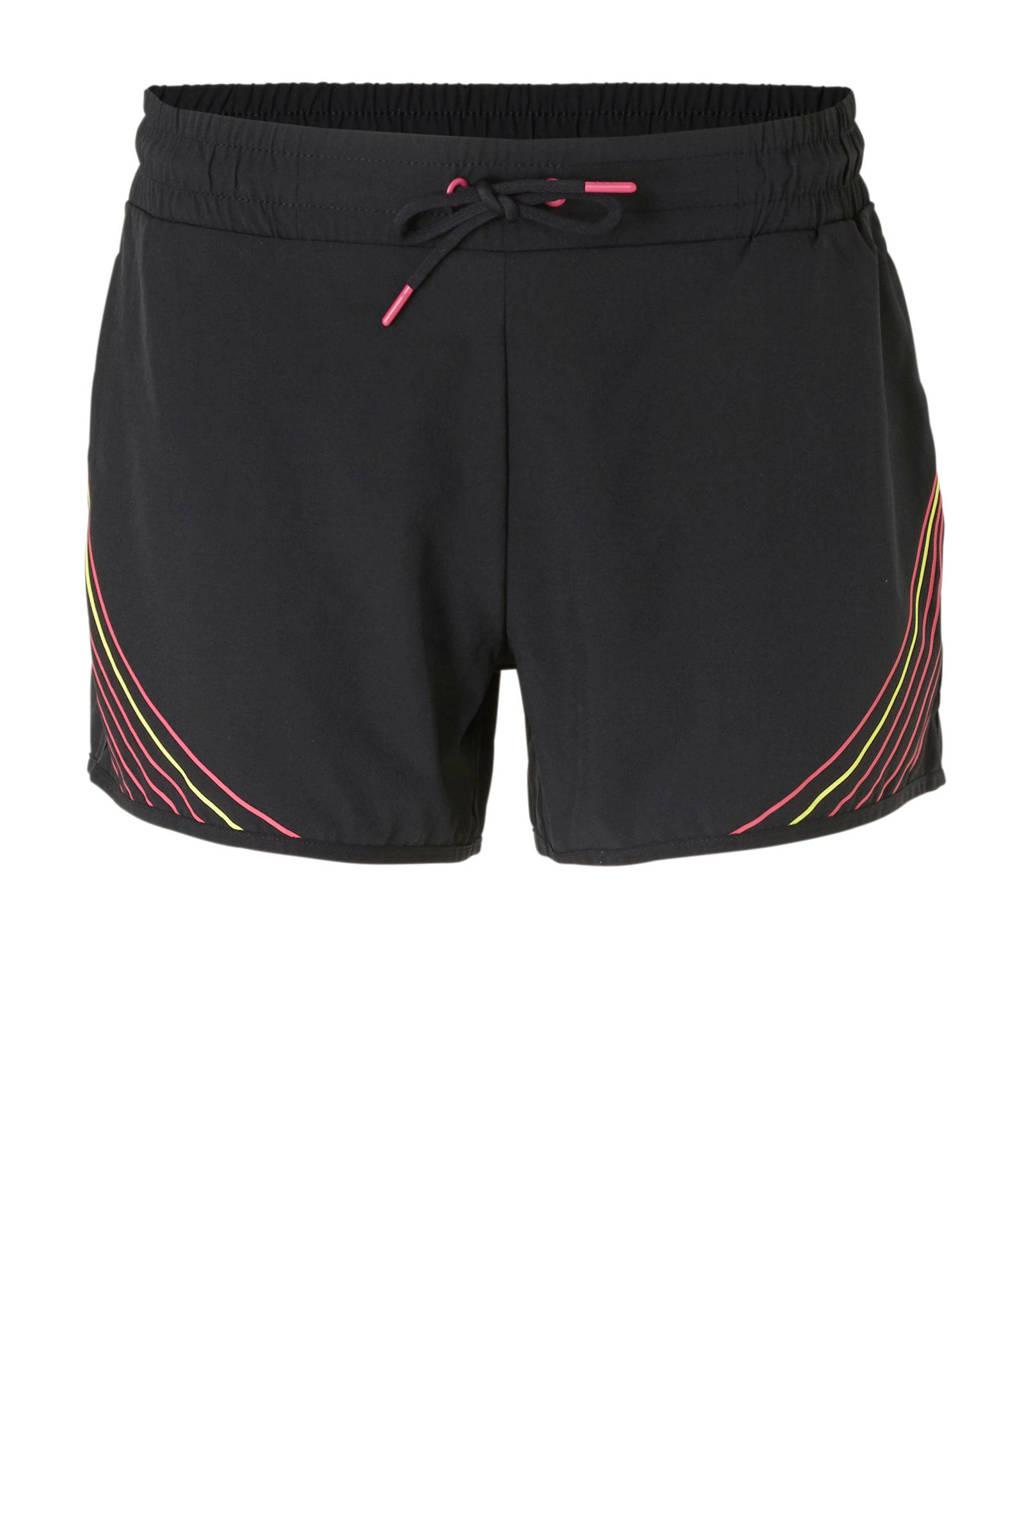 ESPRIT Women Sports sportshort zwart/roze/geel, Zwart/roze/geel